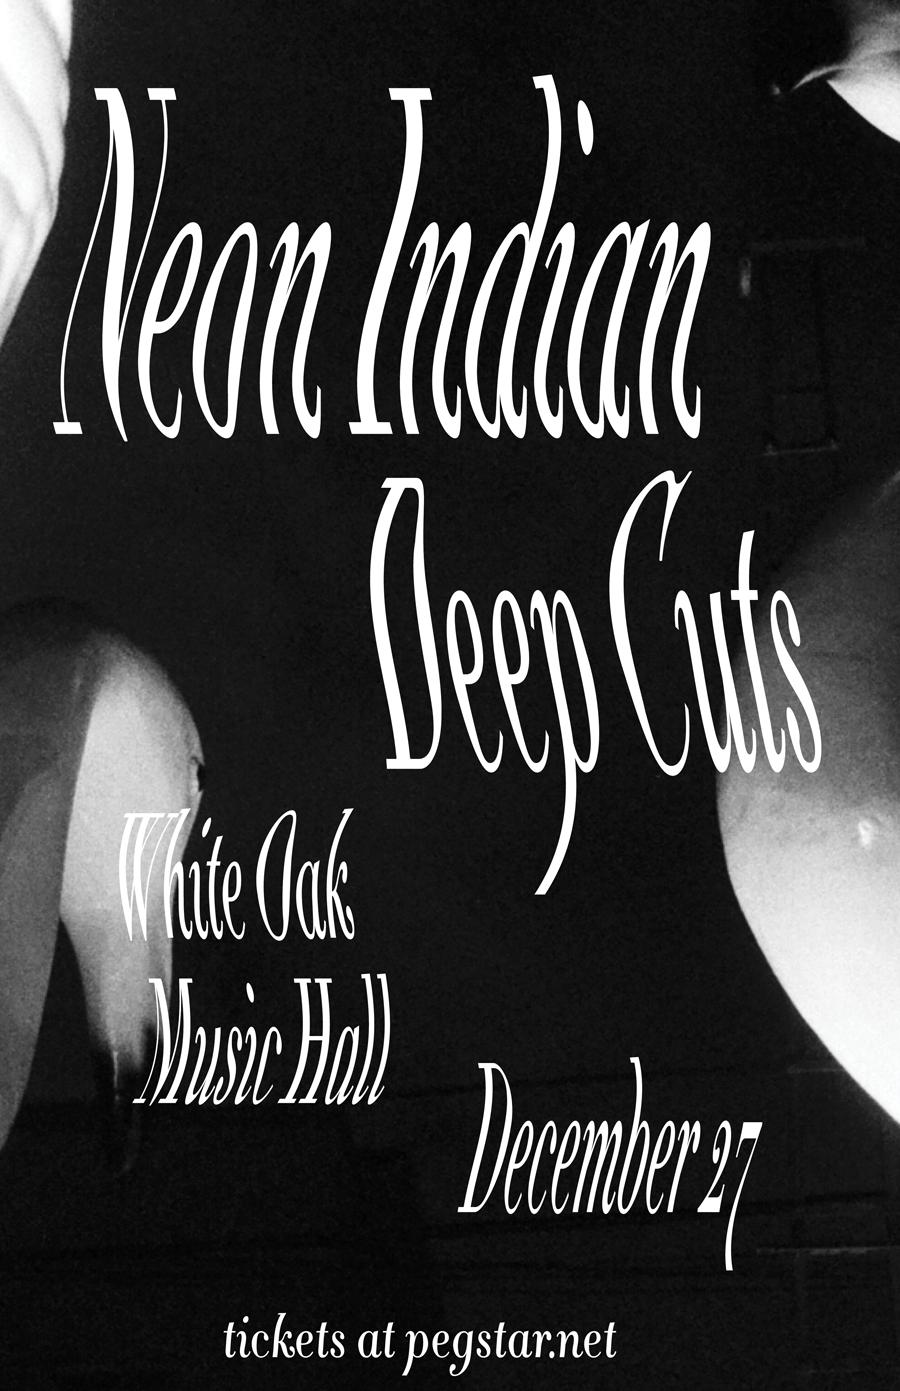 the Valdez-deep cuts flyer-1.png